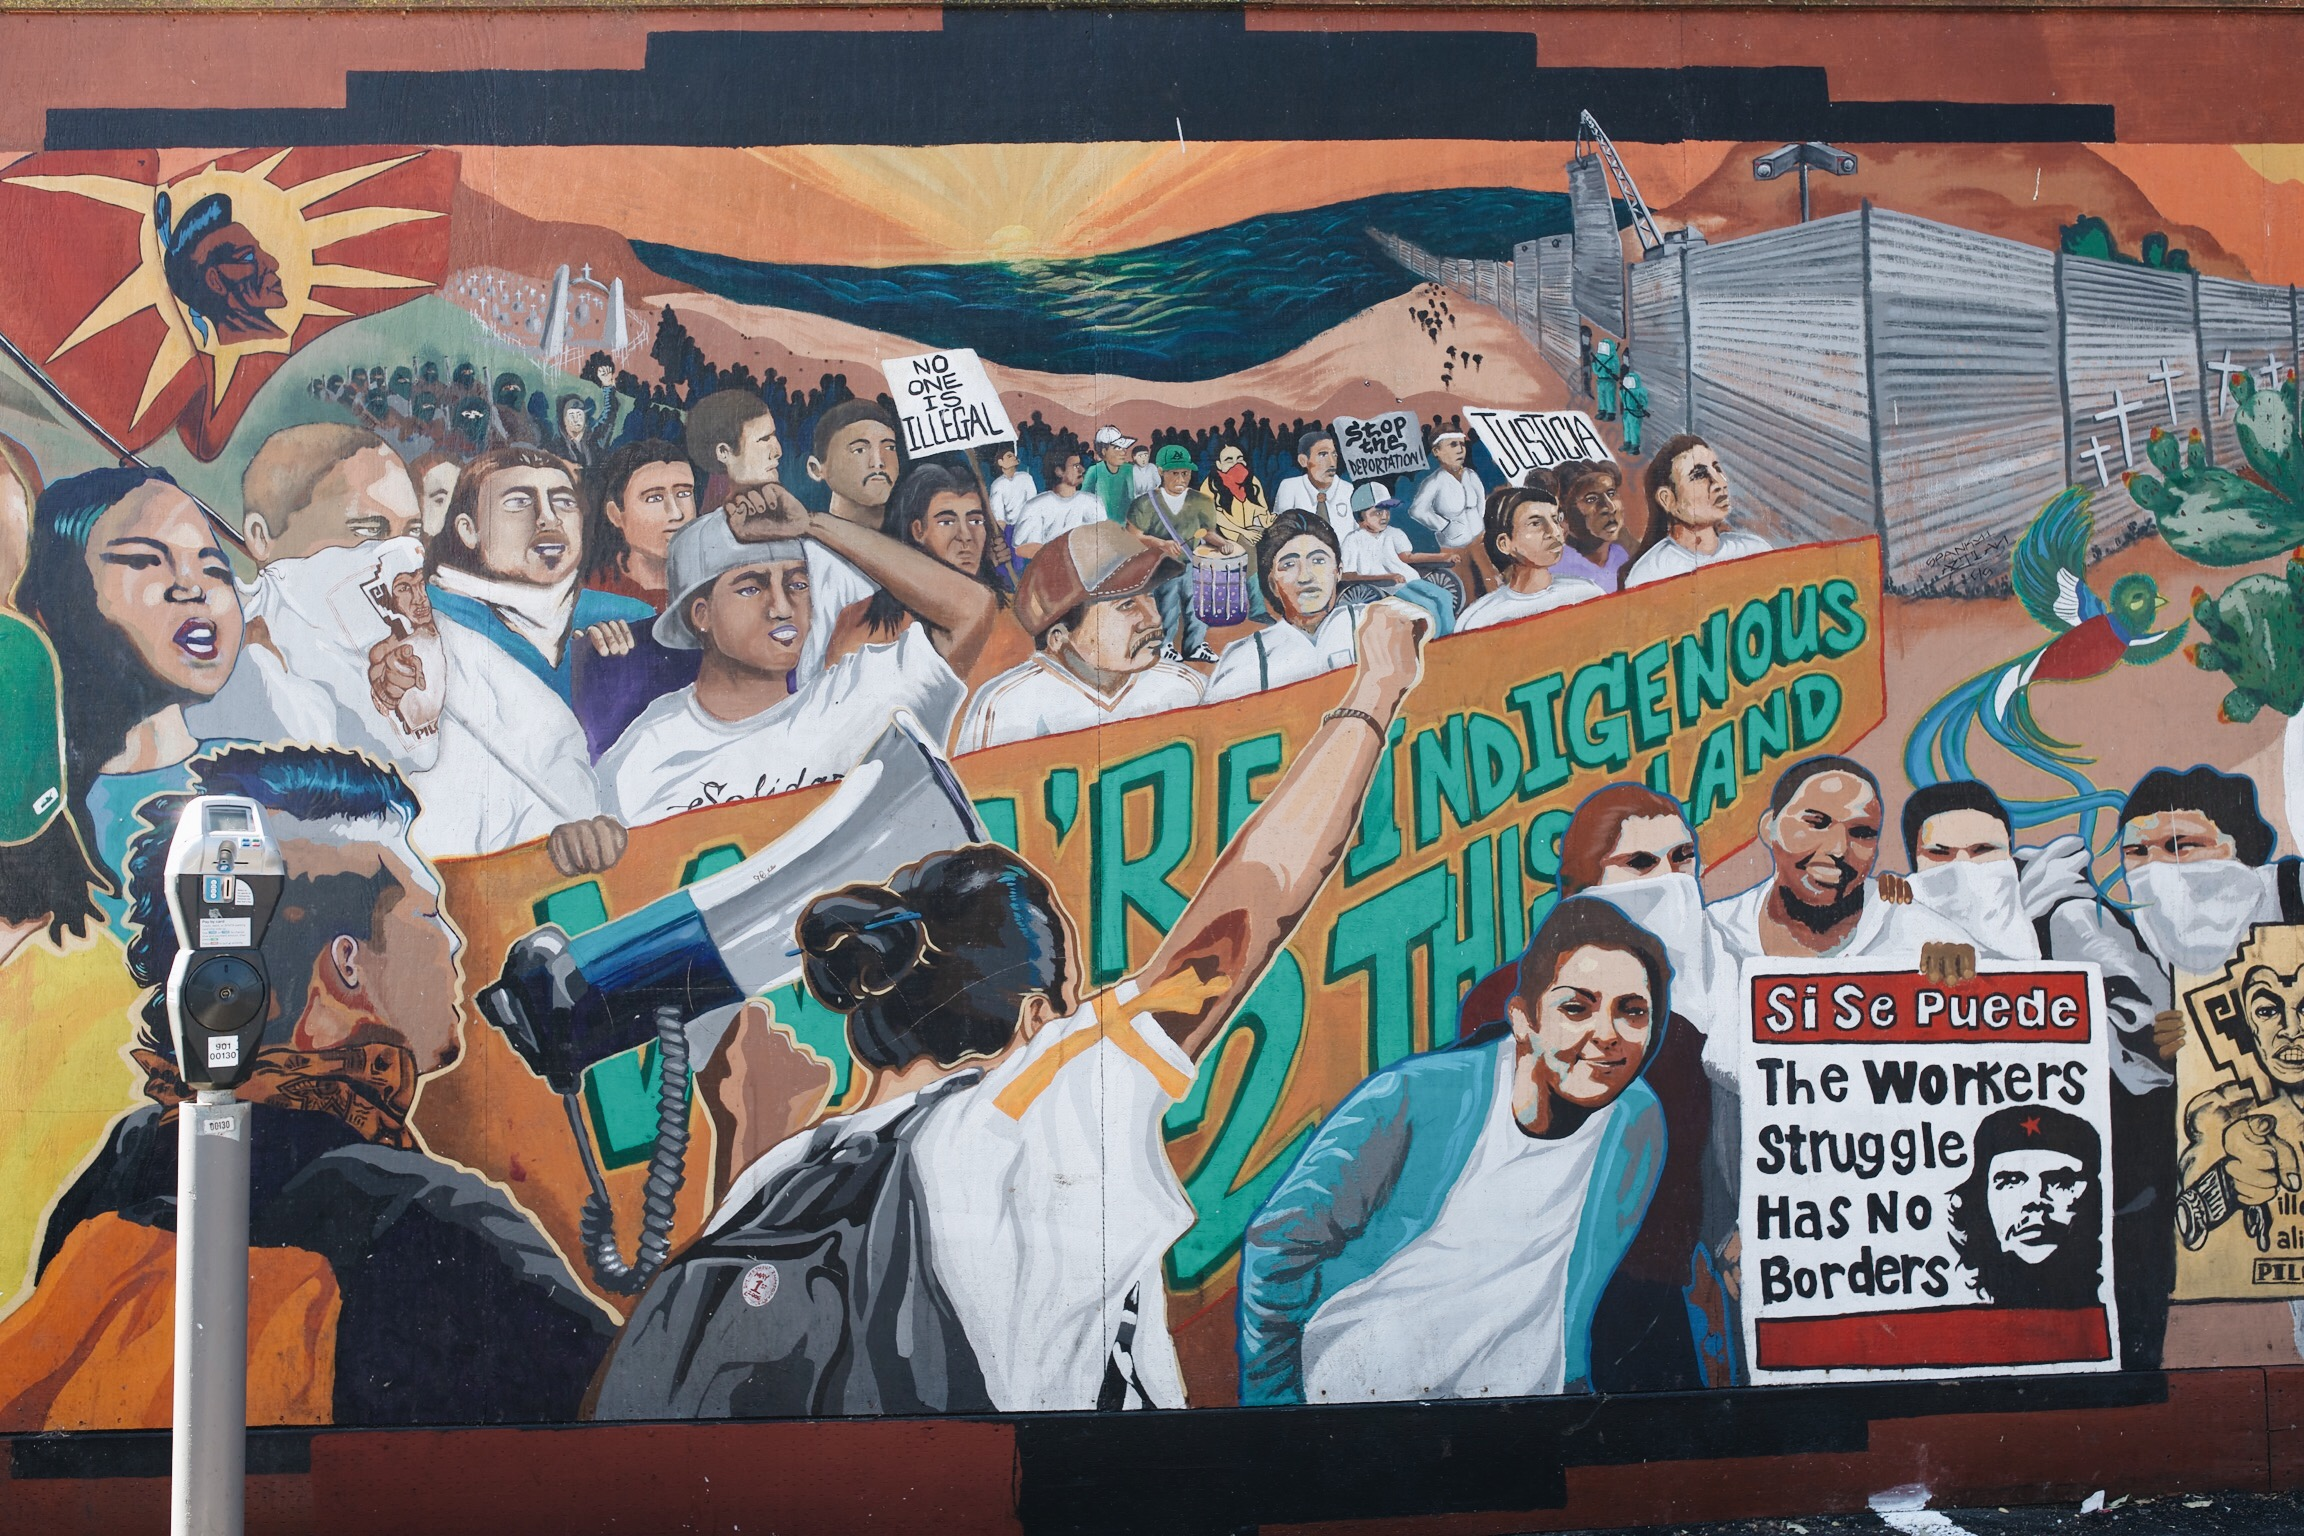 fresques-street-art-san-francisco.JPG